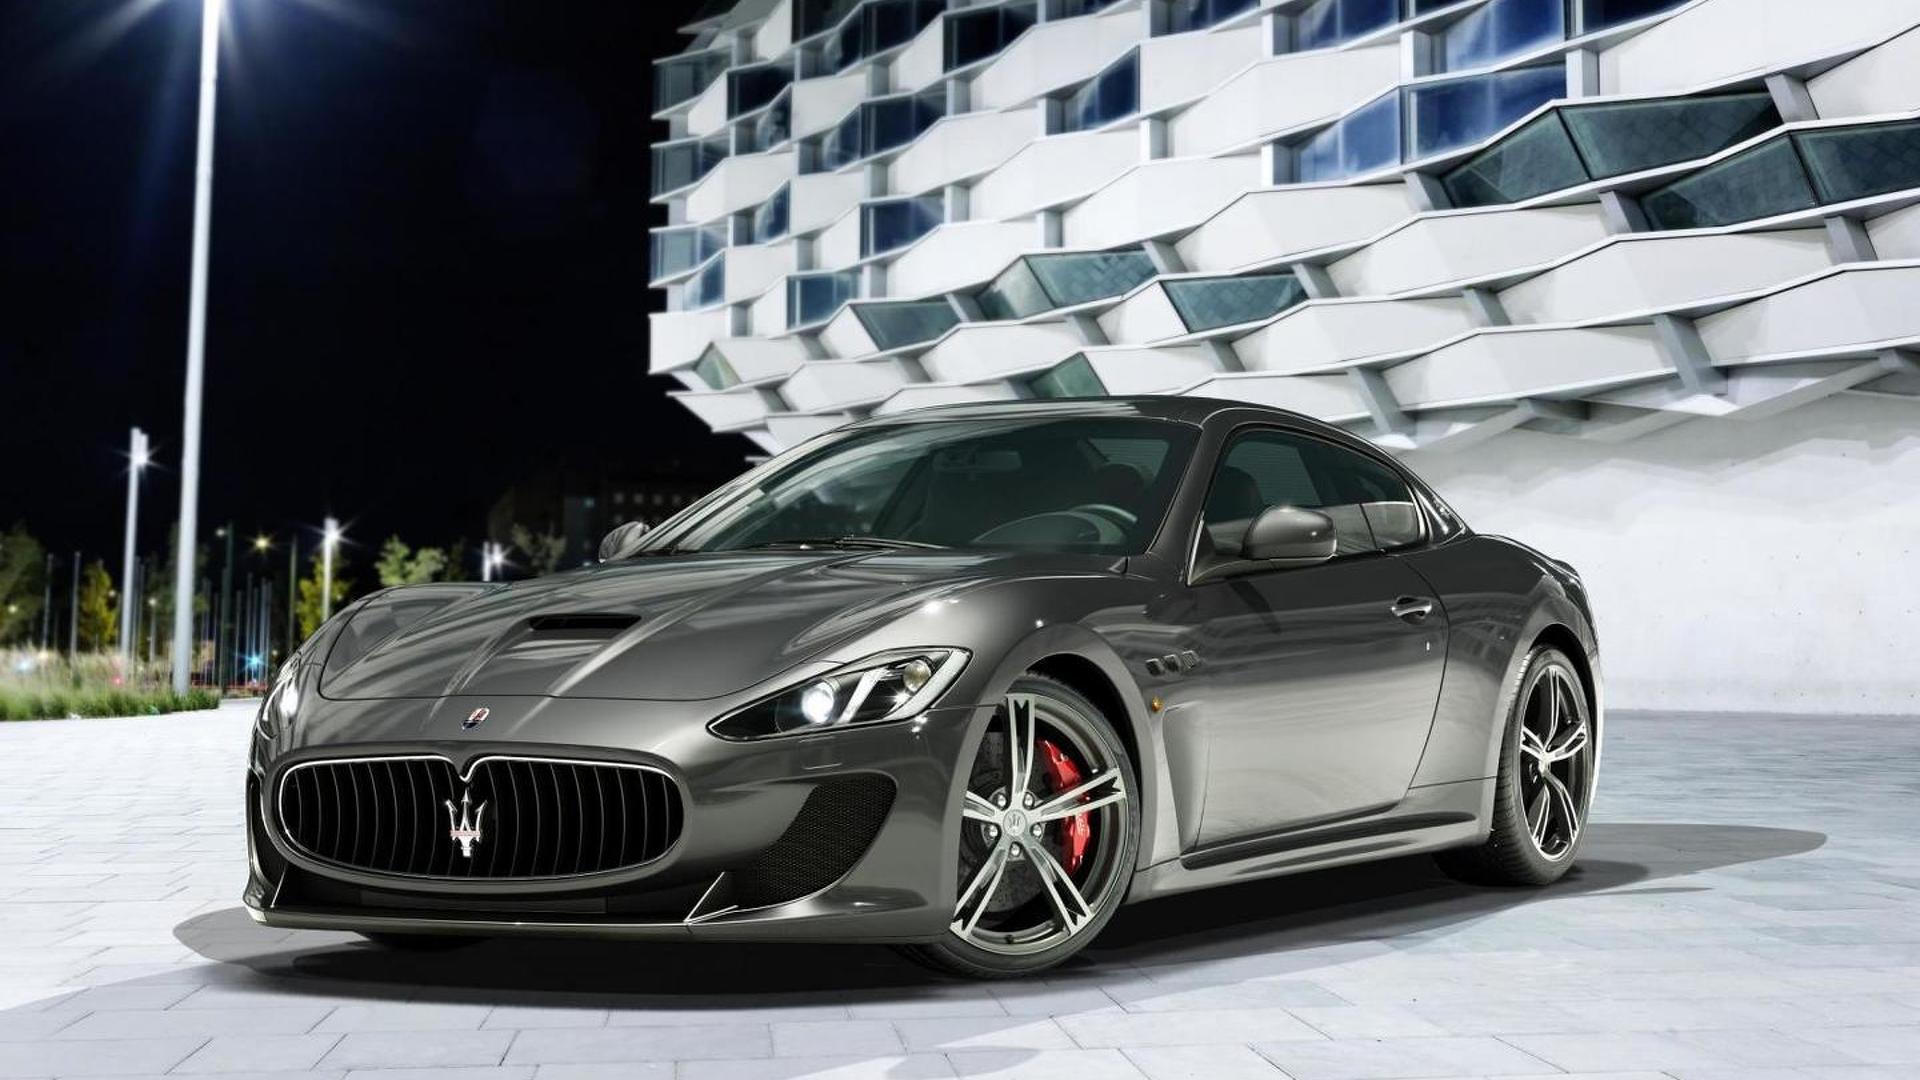 Home gt new maserati gt 2016 maserati gt convertible gt 2016 maserati gt - Home Gt New Maserati Gt 2016 Maserati Gt Convertible Gt 2016 Maserati Gt 42